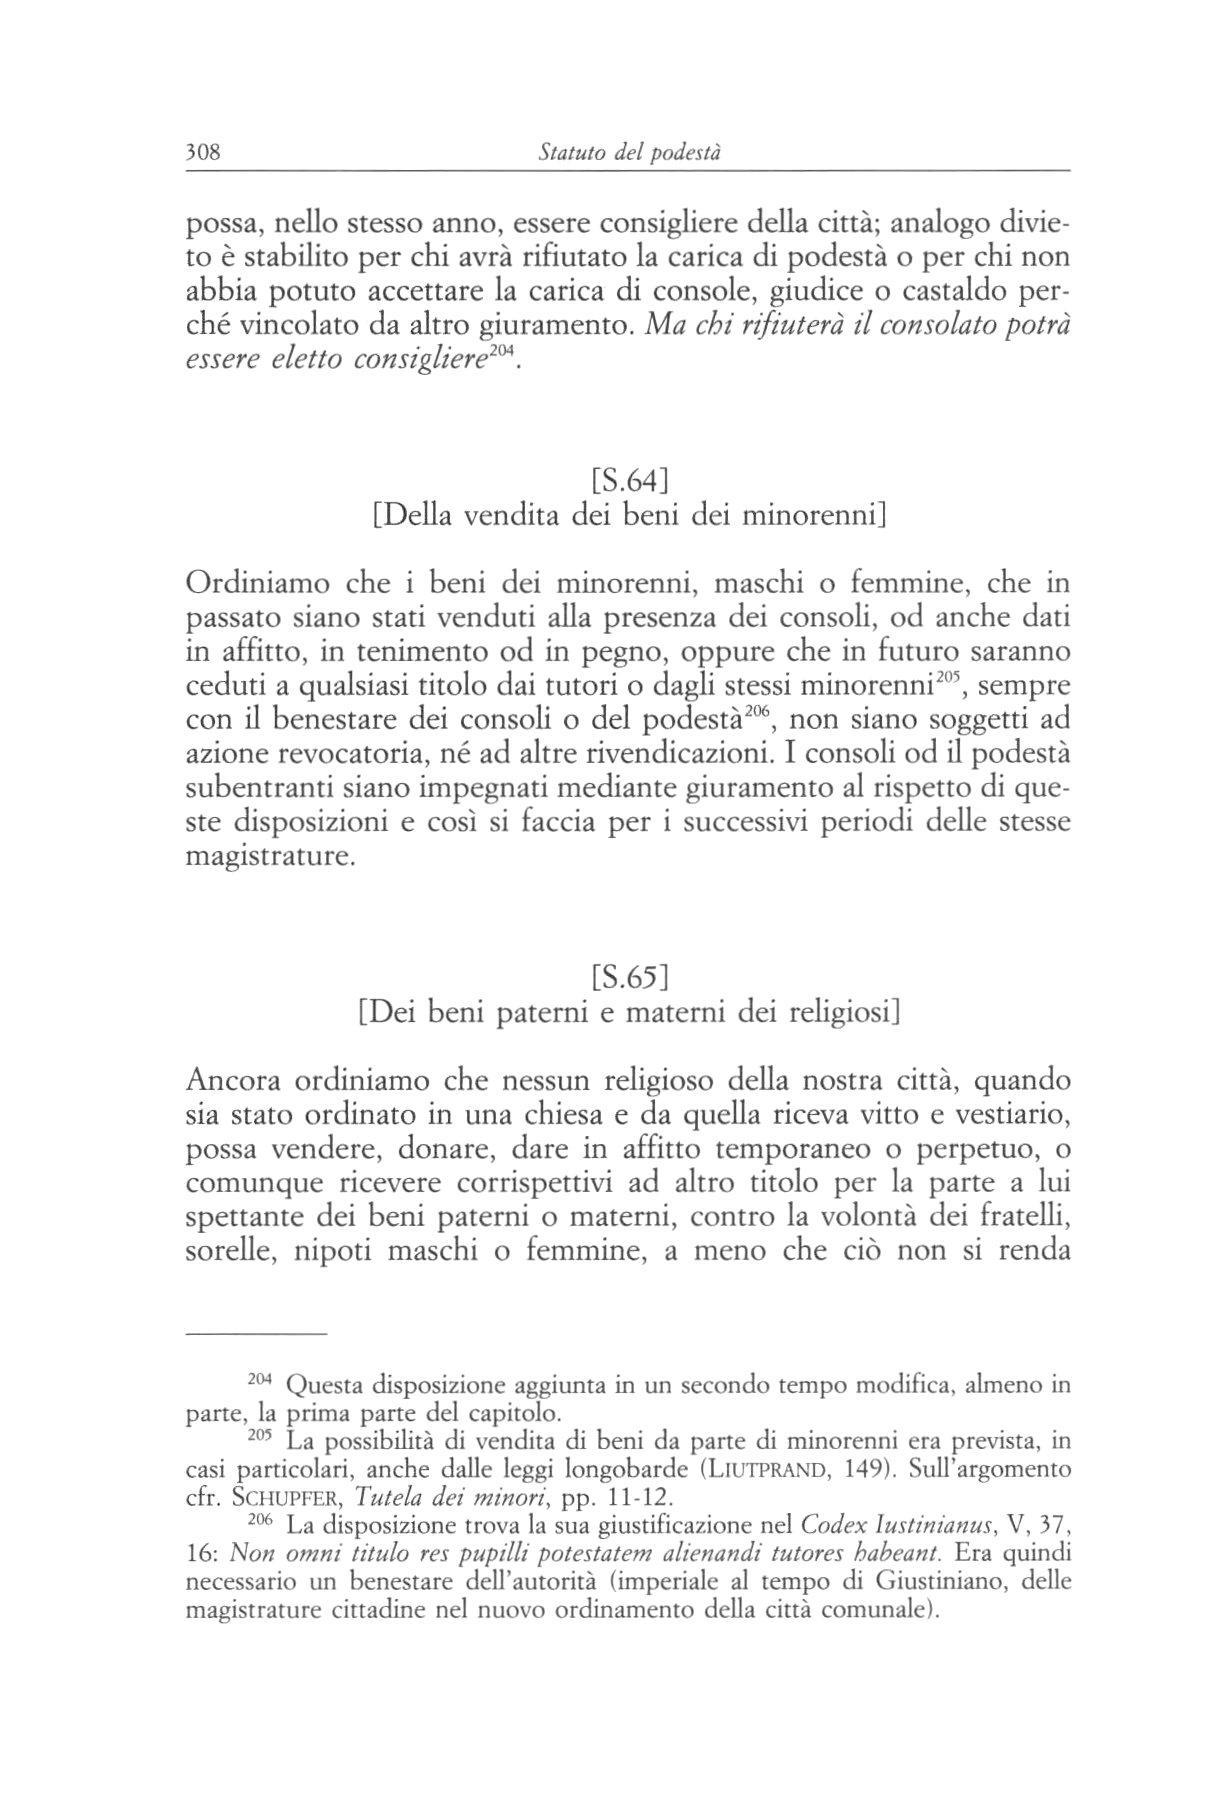 statuti pistoiesi del sec.XII 0308.jpg